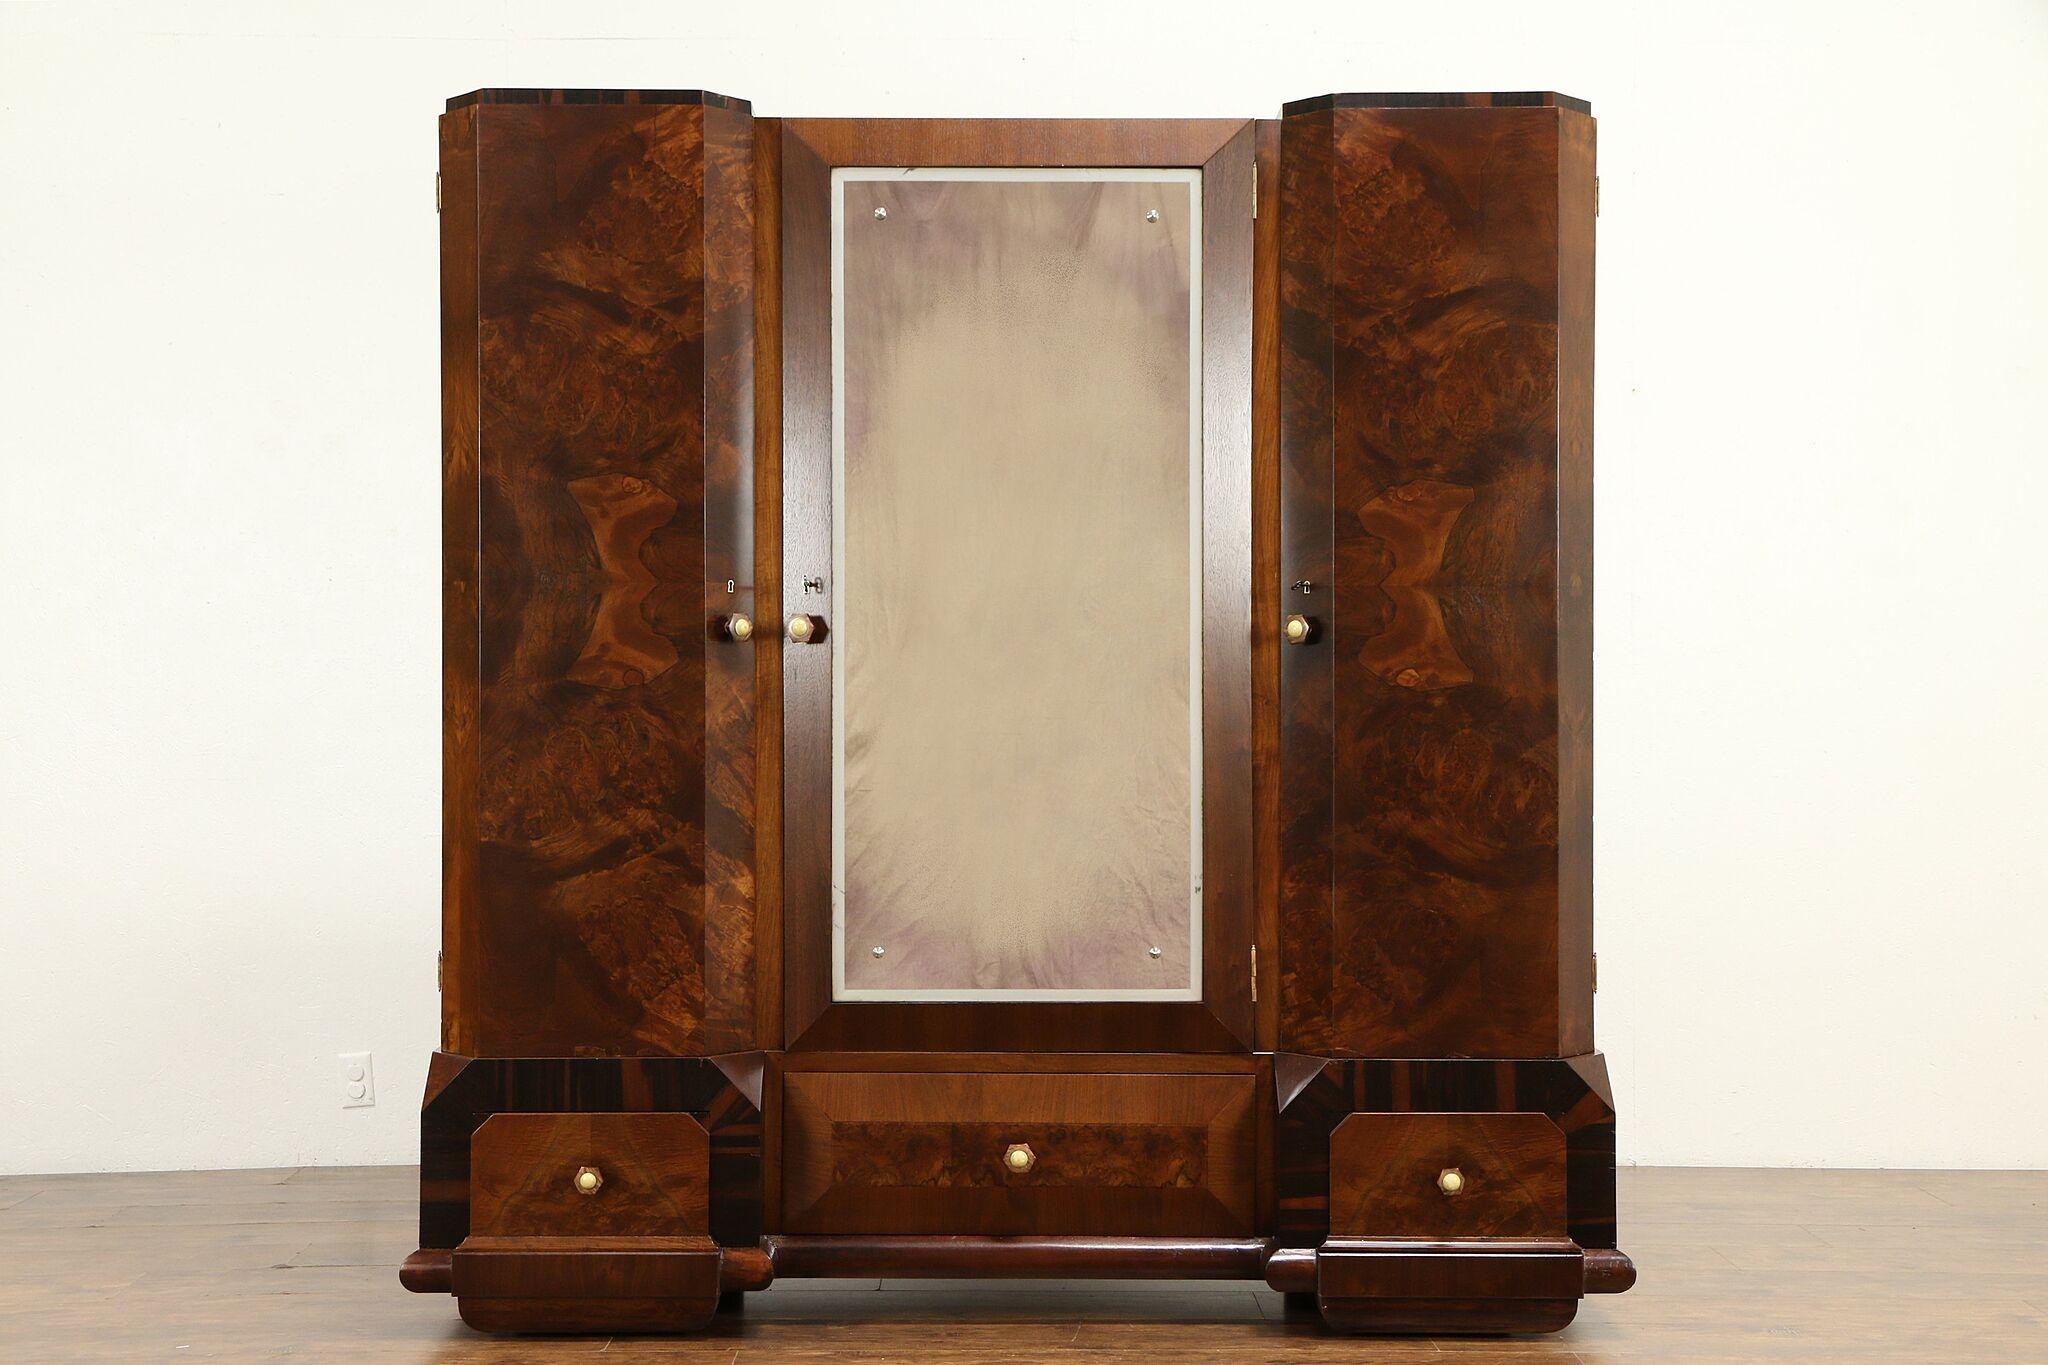 Sold Italian Art Deco Rosewood Antique Armoire Closet Or Wardrobe 31555 Harp Gallery Antiques Furniture